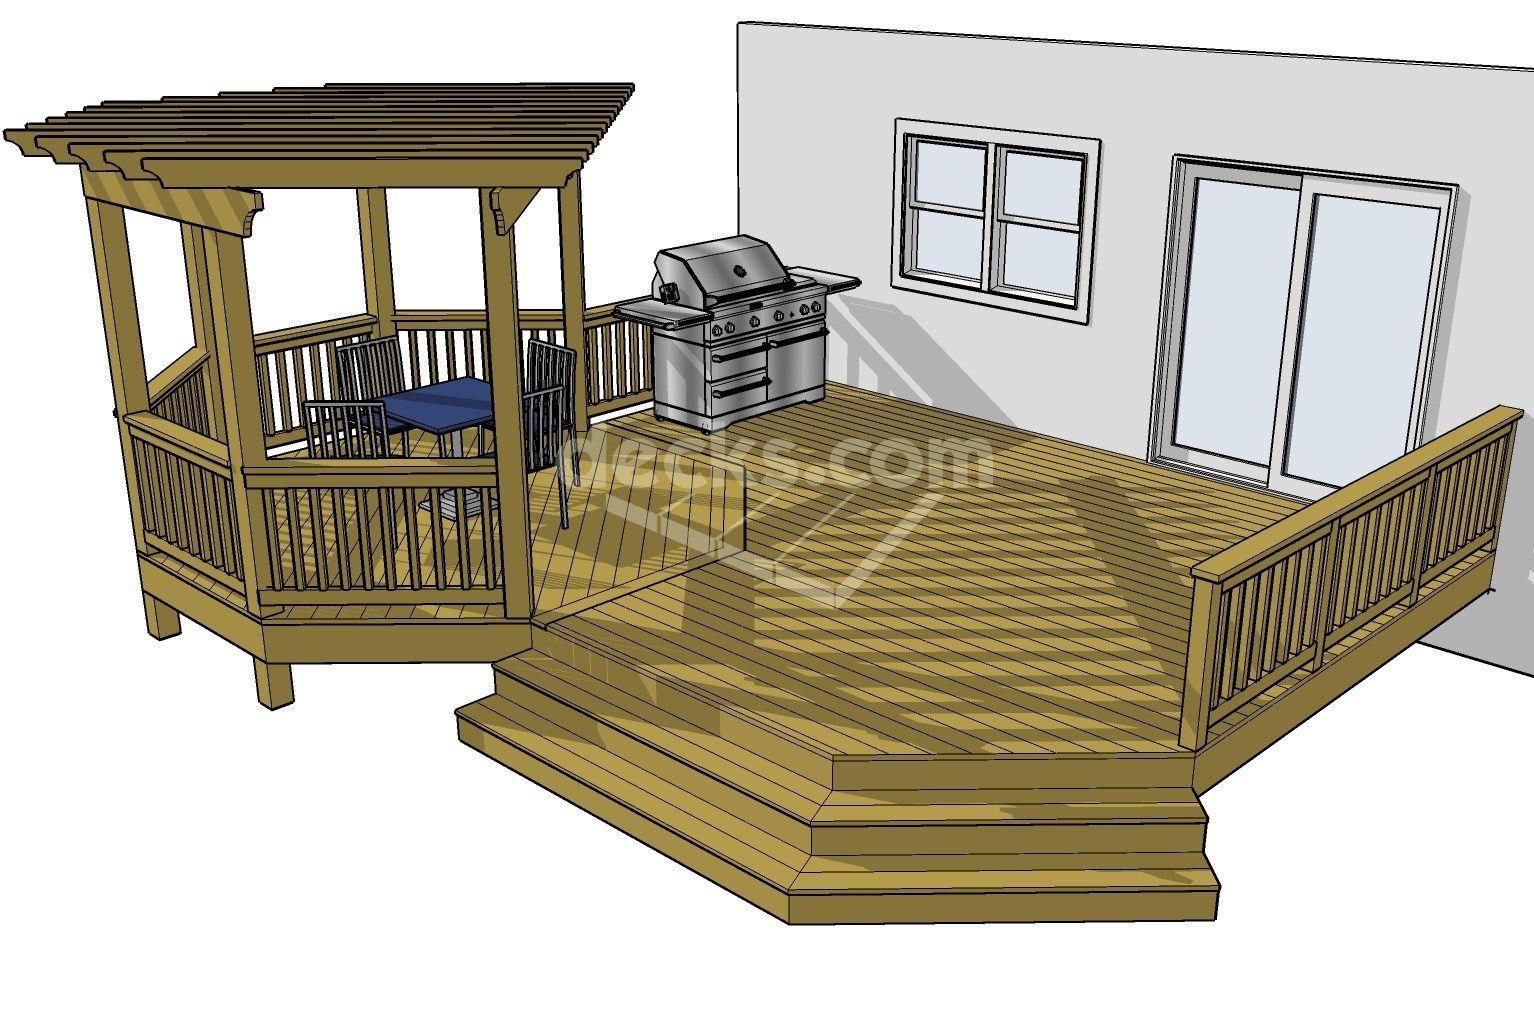 The Best Tips For Deck Designs To Create A Splendid Deck Decorifusta Free Deck Plans Diy Deck Deck Design